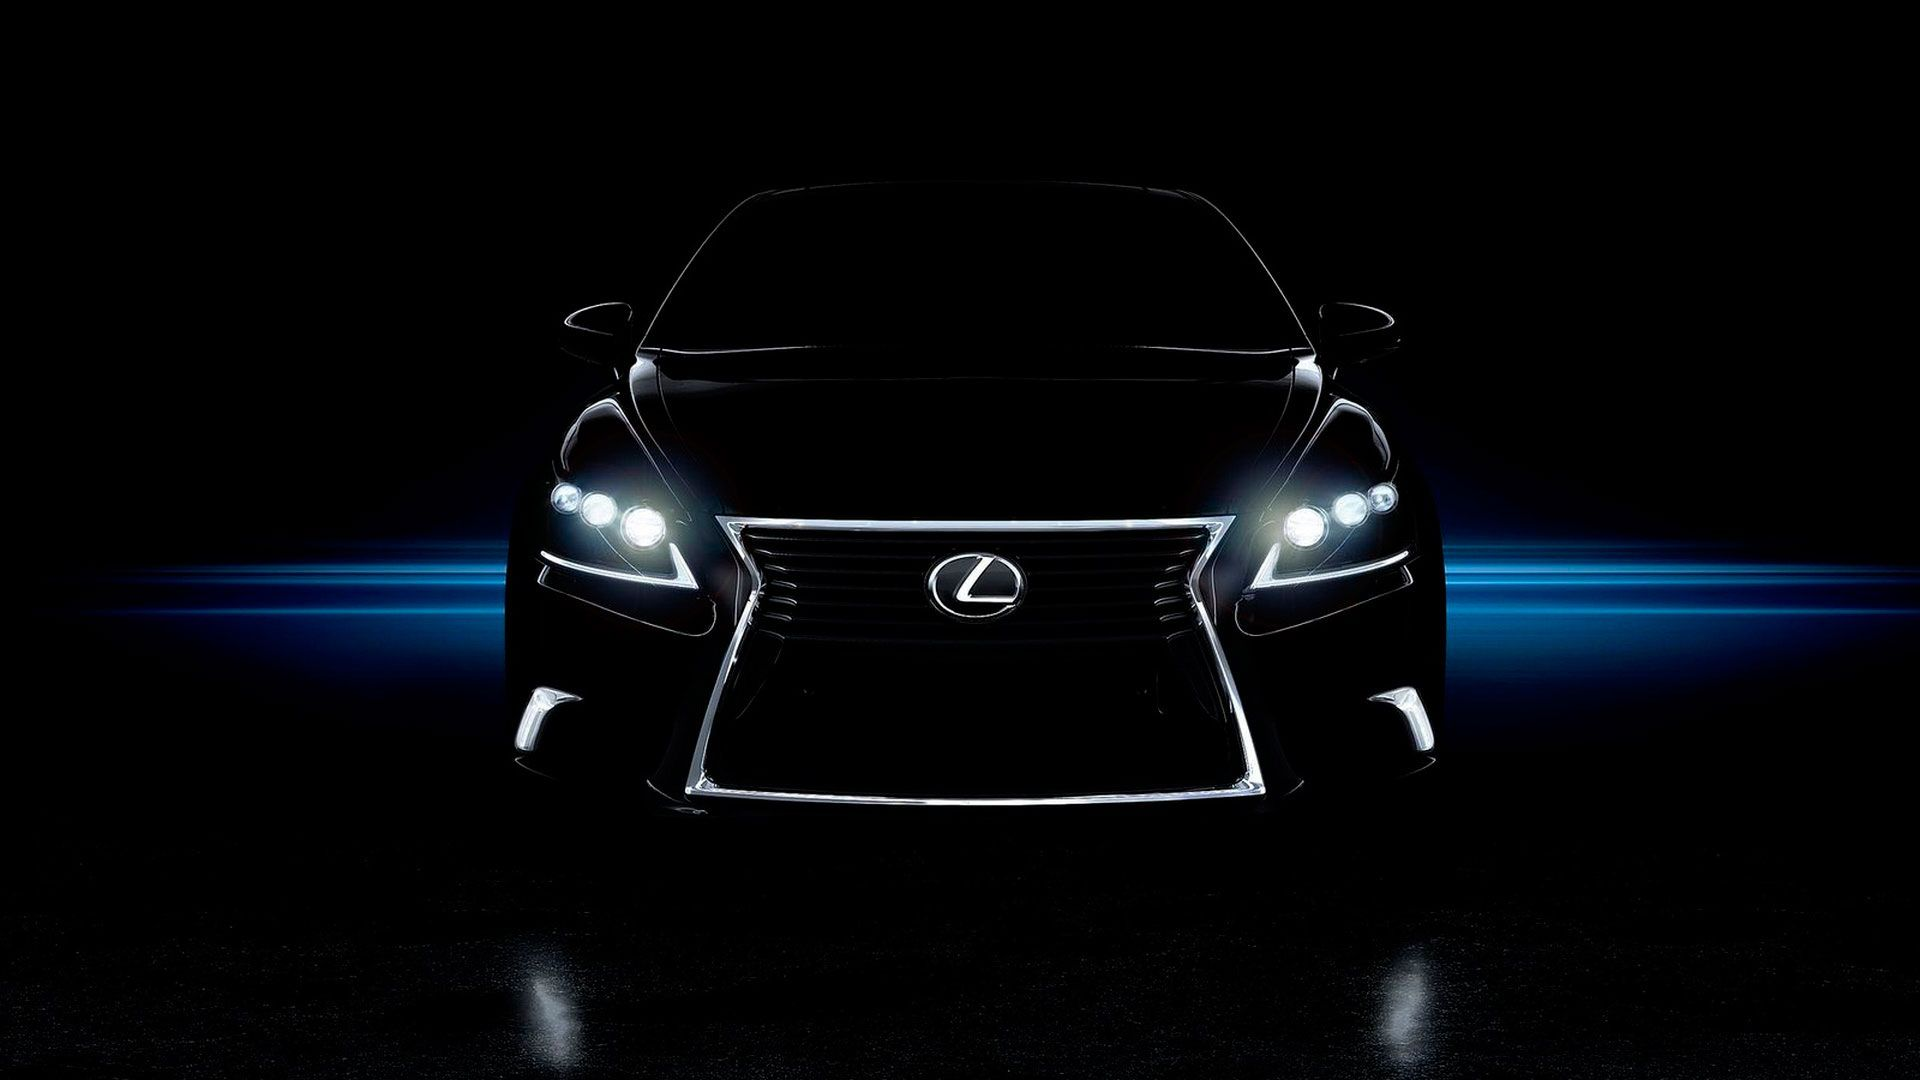 Pin By Yuliya Safonova On Black Lexus Ls Lexus Ls 460 Sports Cars Luxury